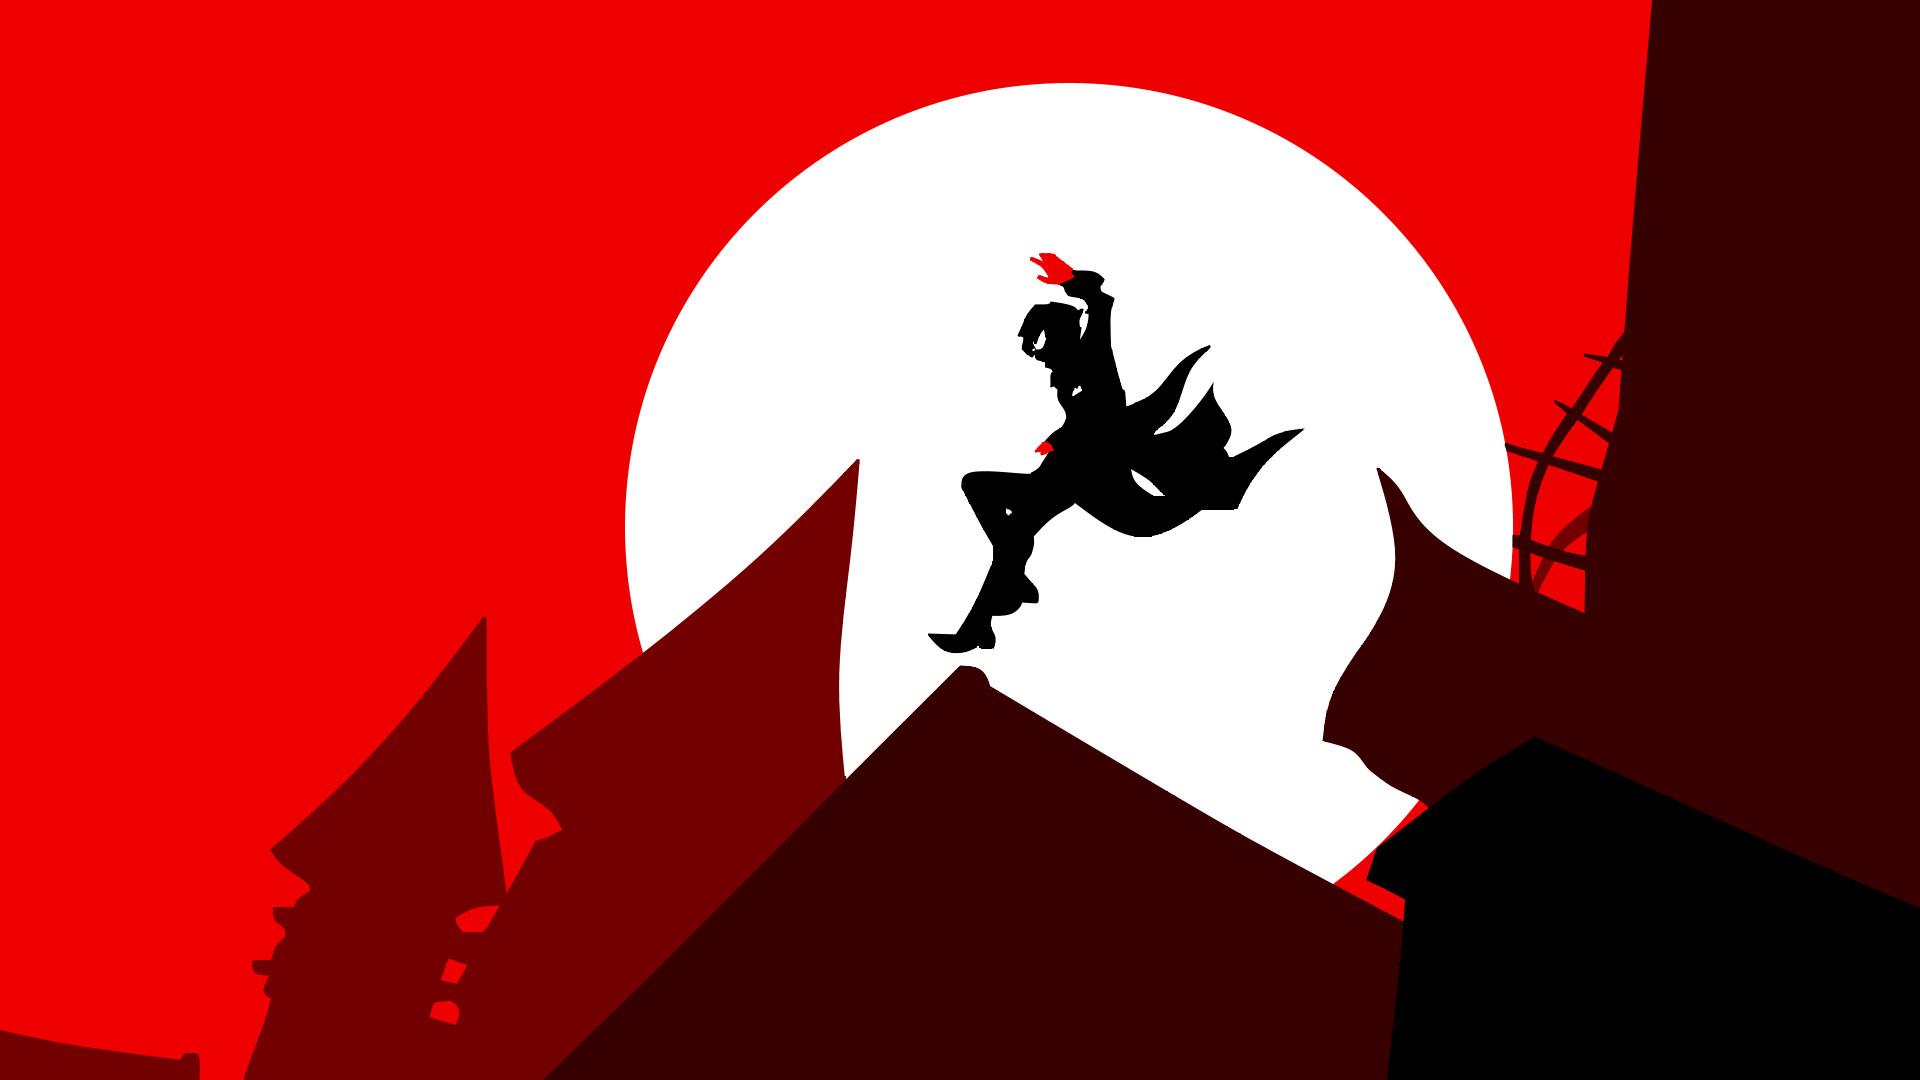 Persona5 Silhouette Wallpaper by Elysianaura Persona5 Silhouette Wallpaper  by Elysianaura